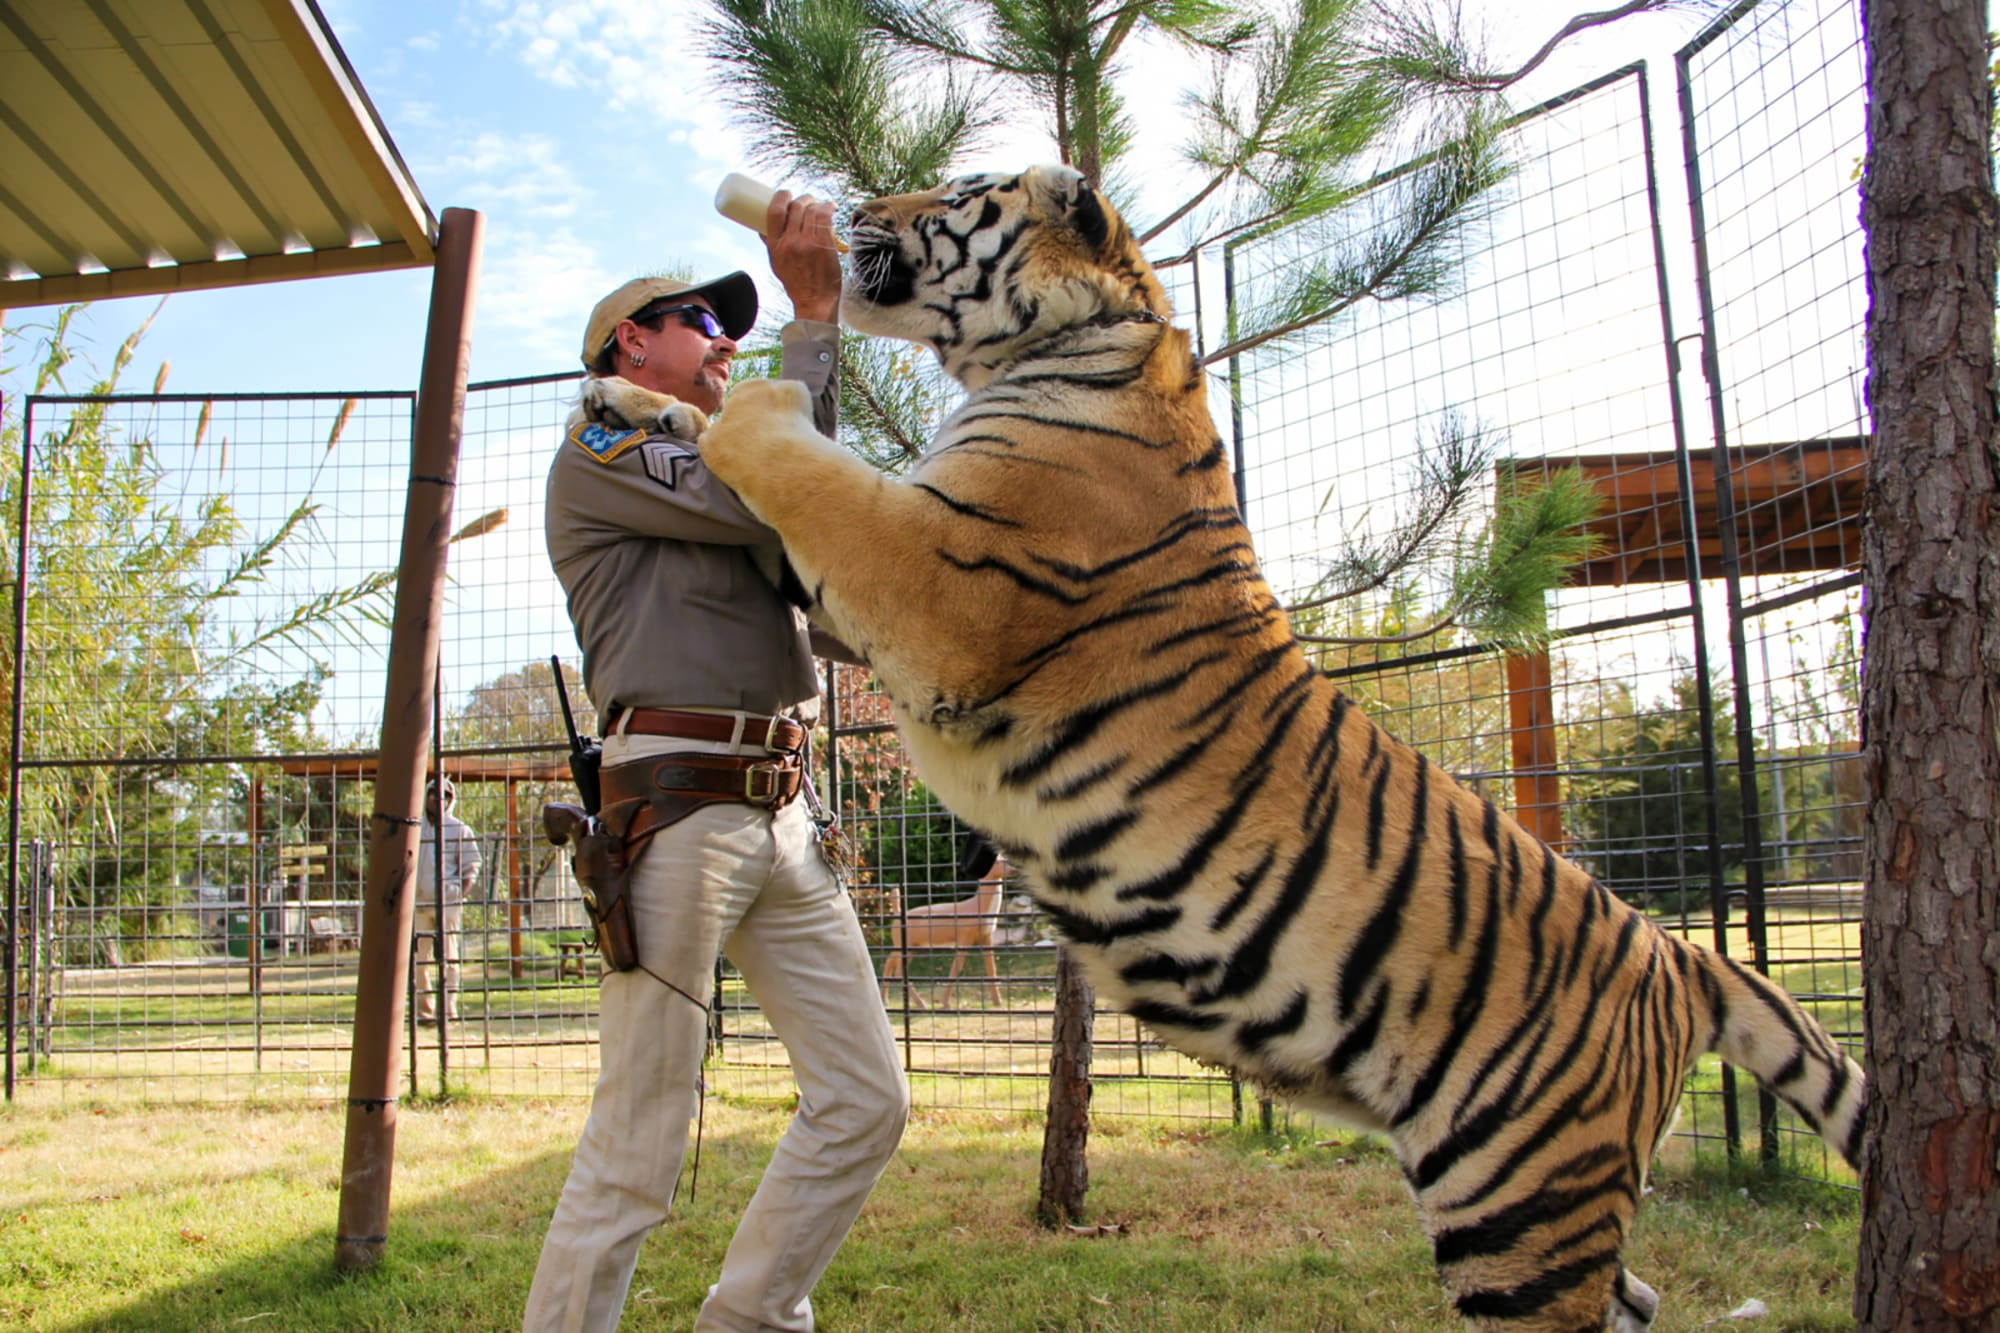 Tiger King season 2 release date confirmed for November 2021